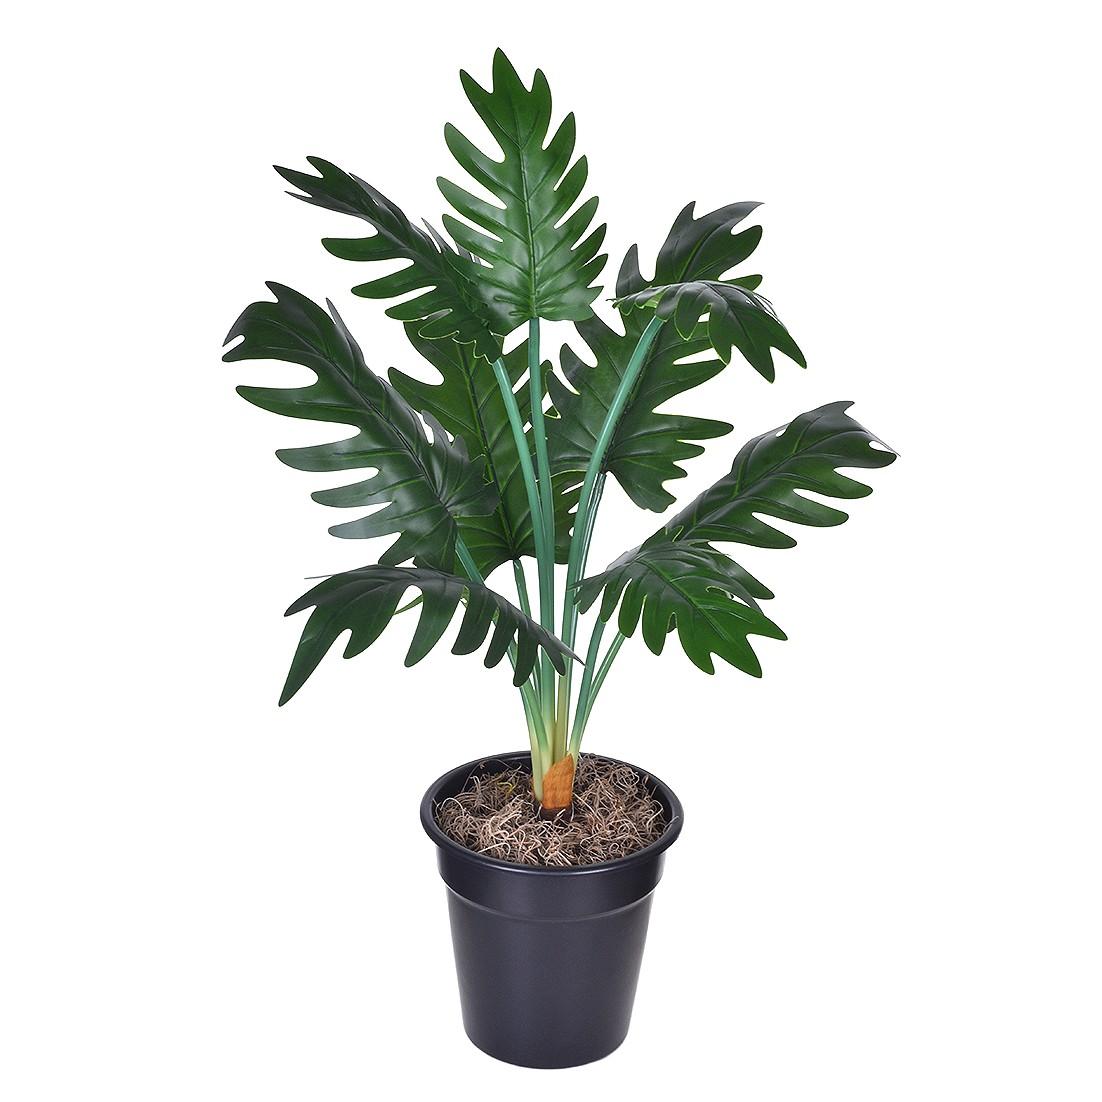 Planta Artificial Espinha de Peixe 66cm Verde